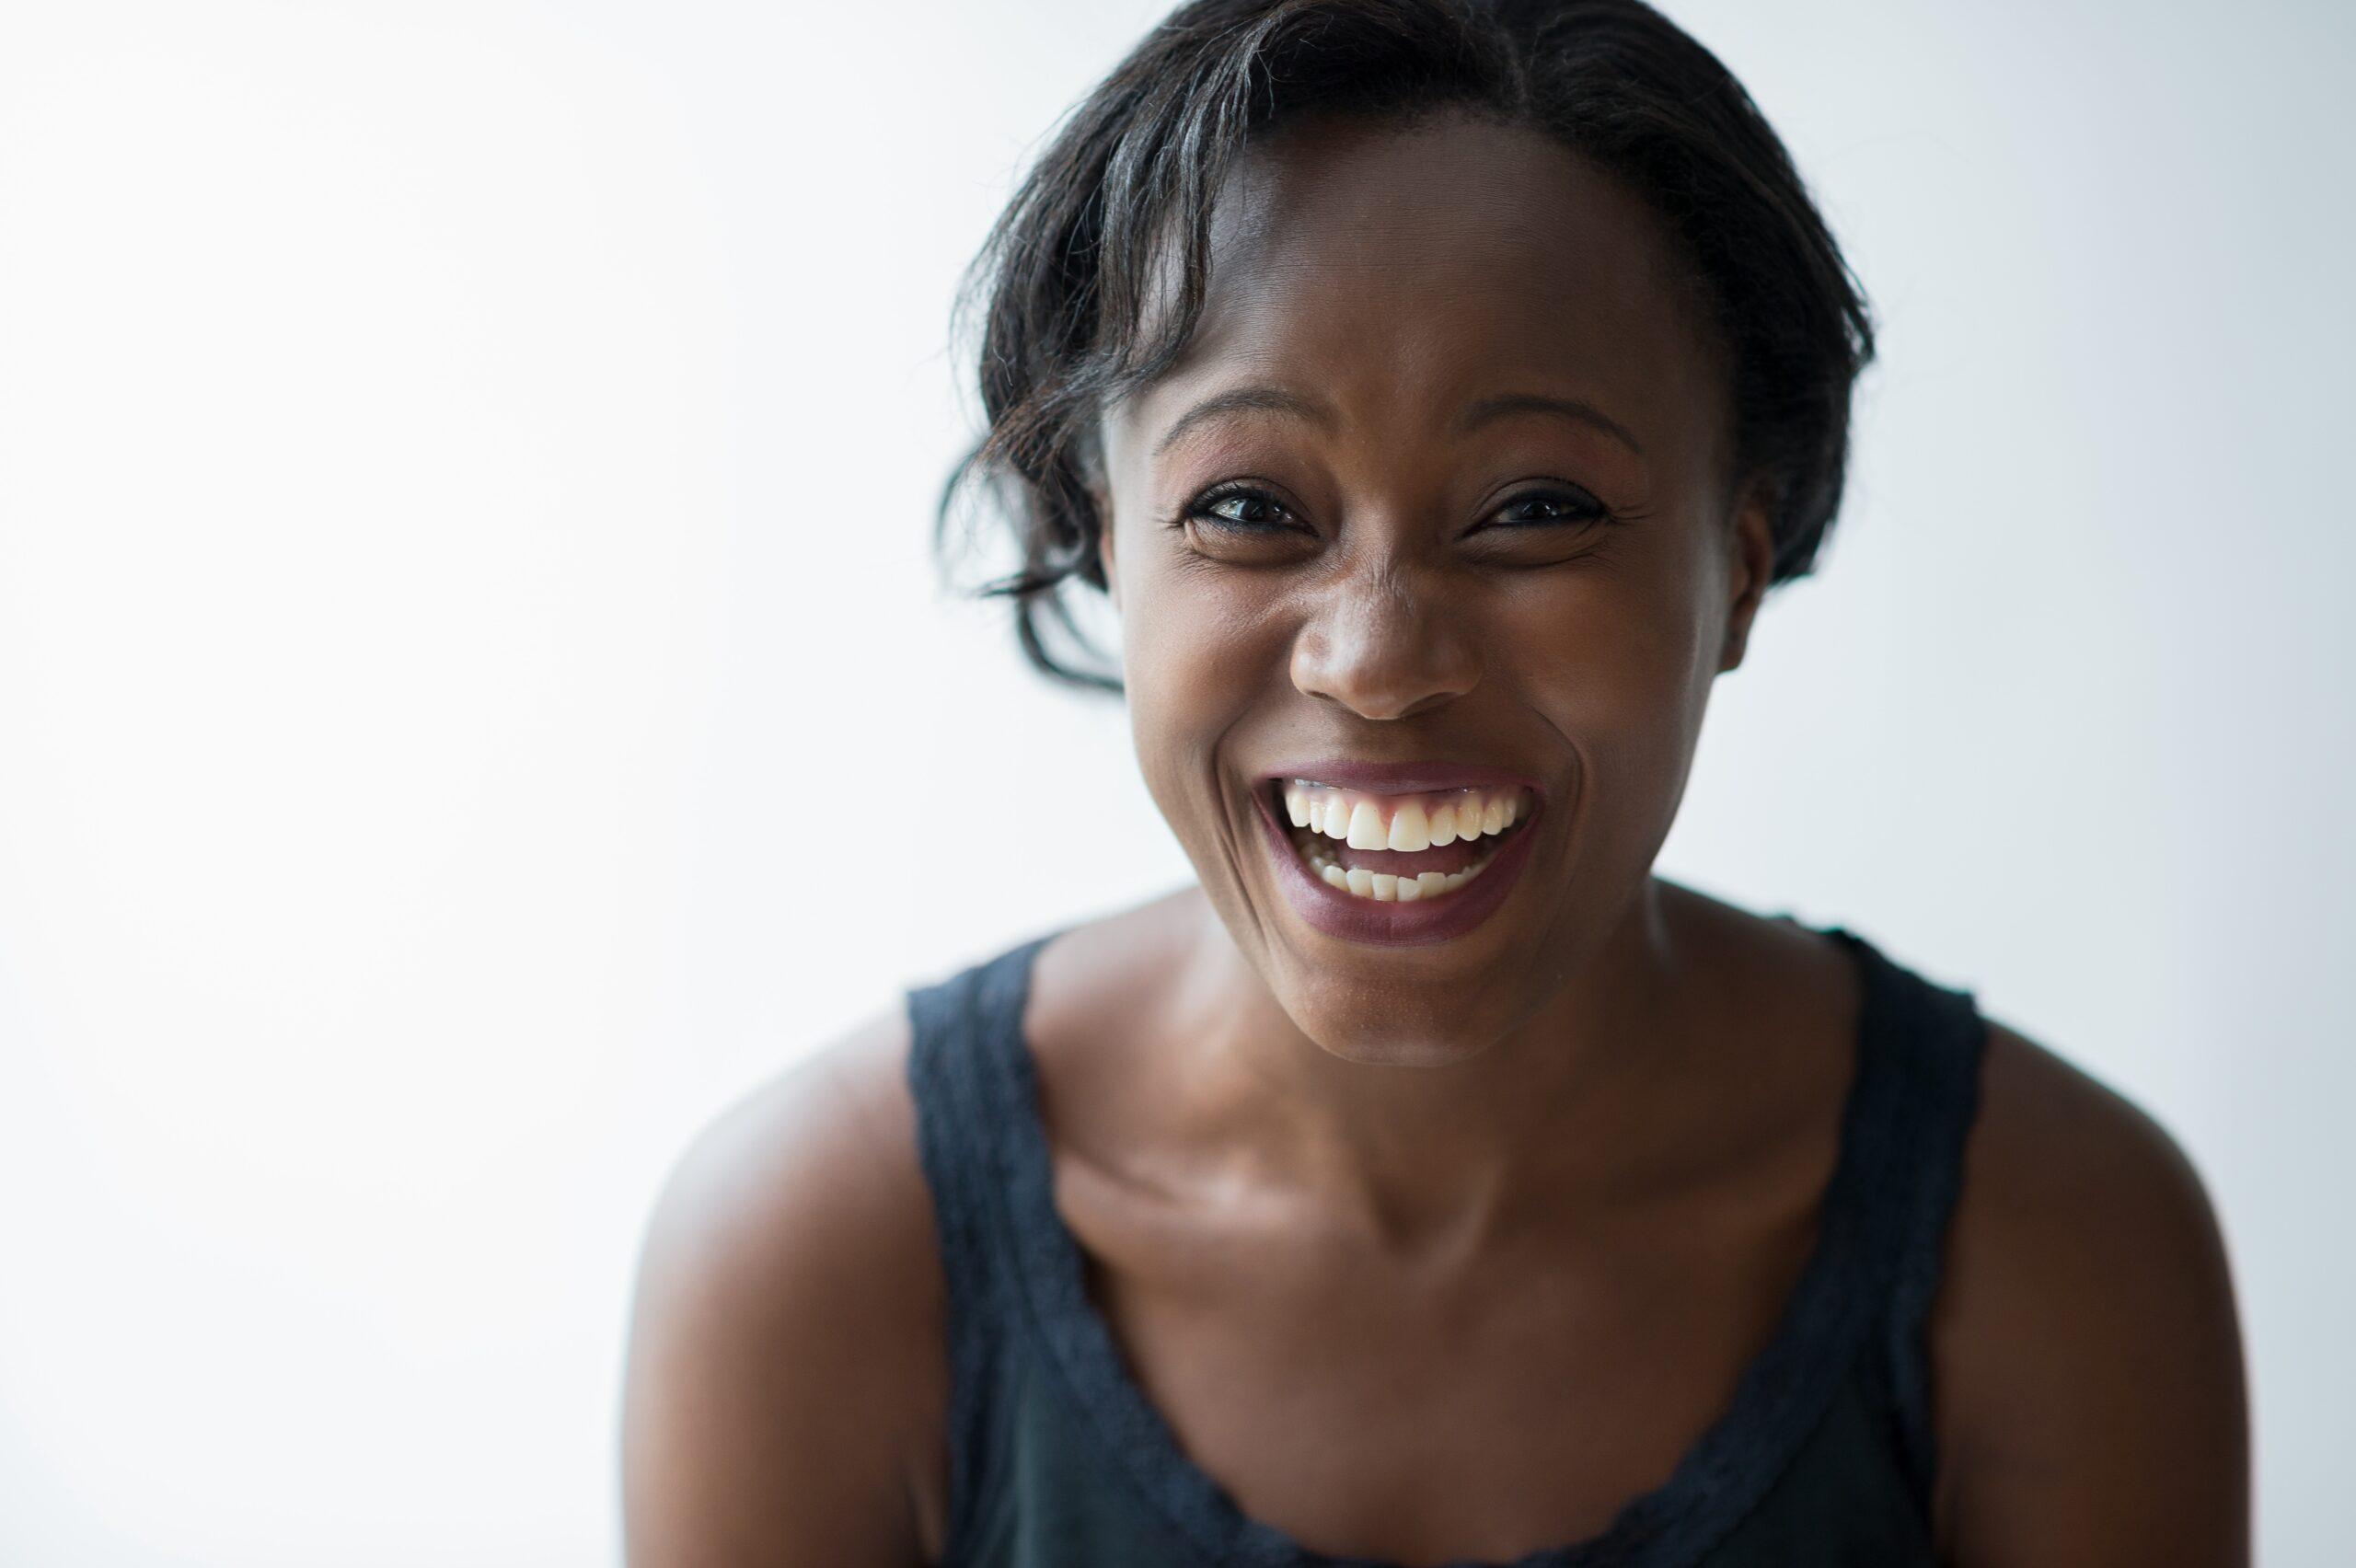 We Love Making You Smile | Lake City Dentist